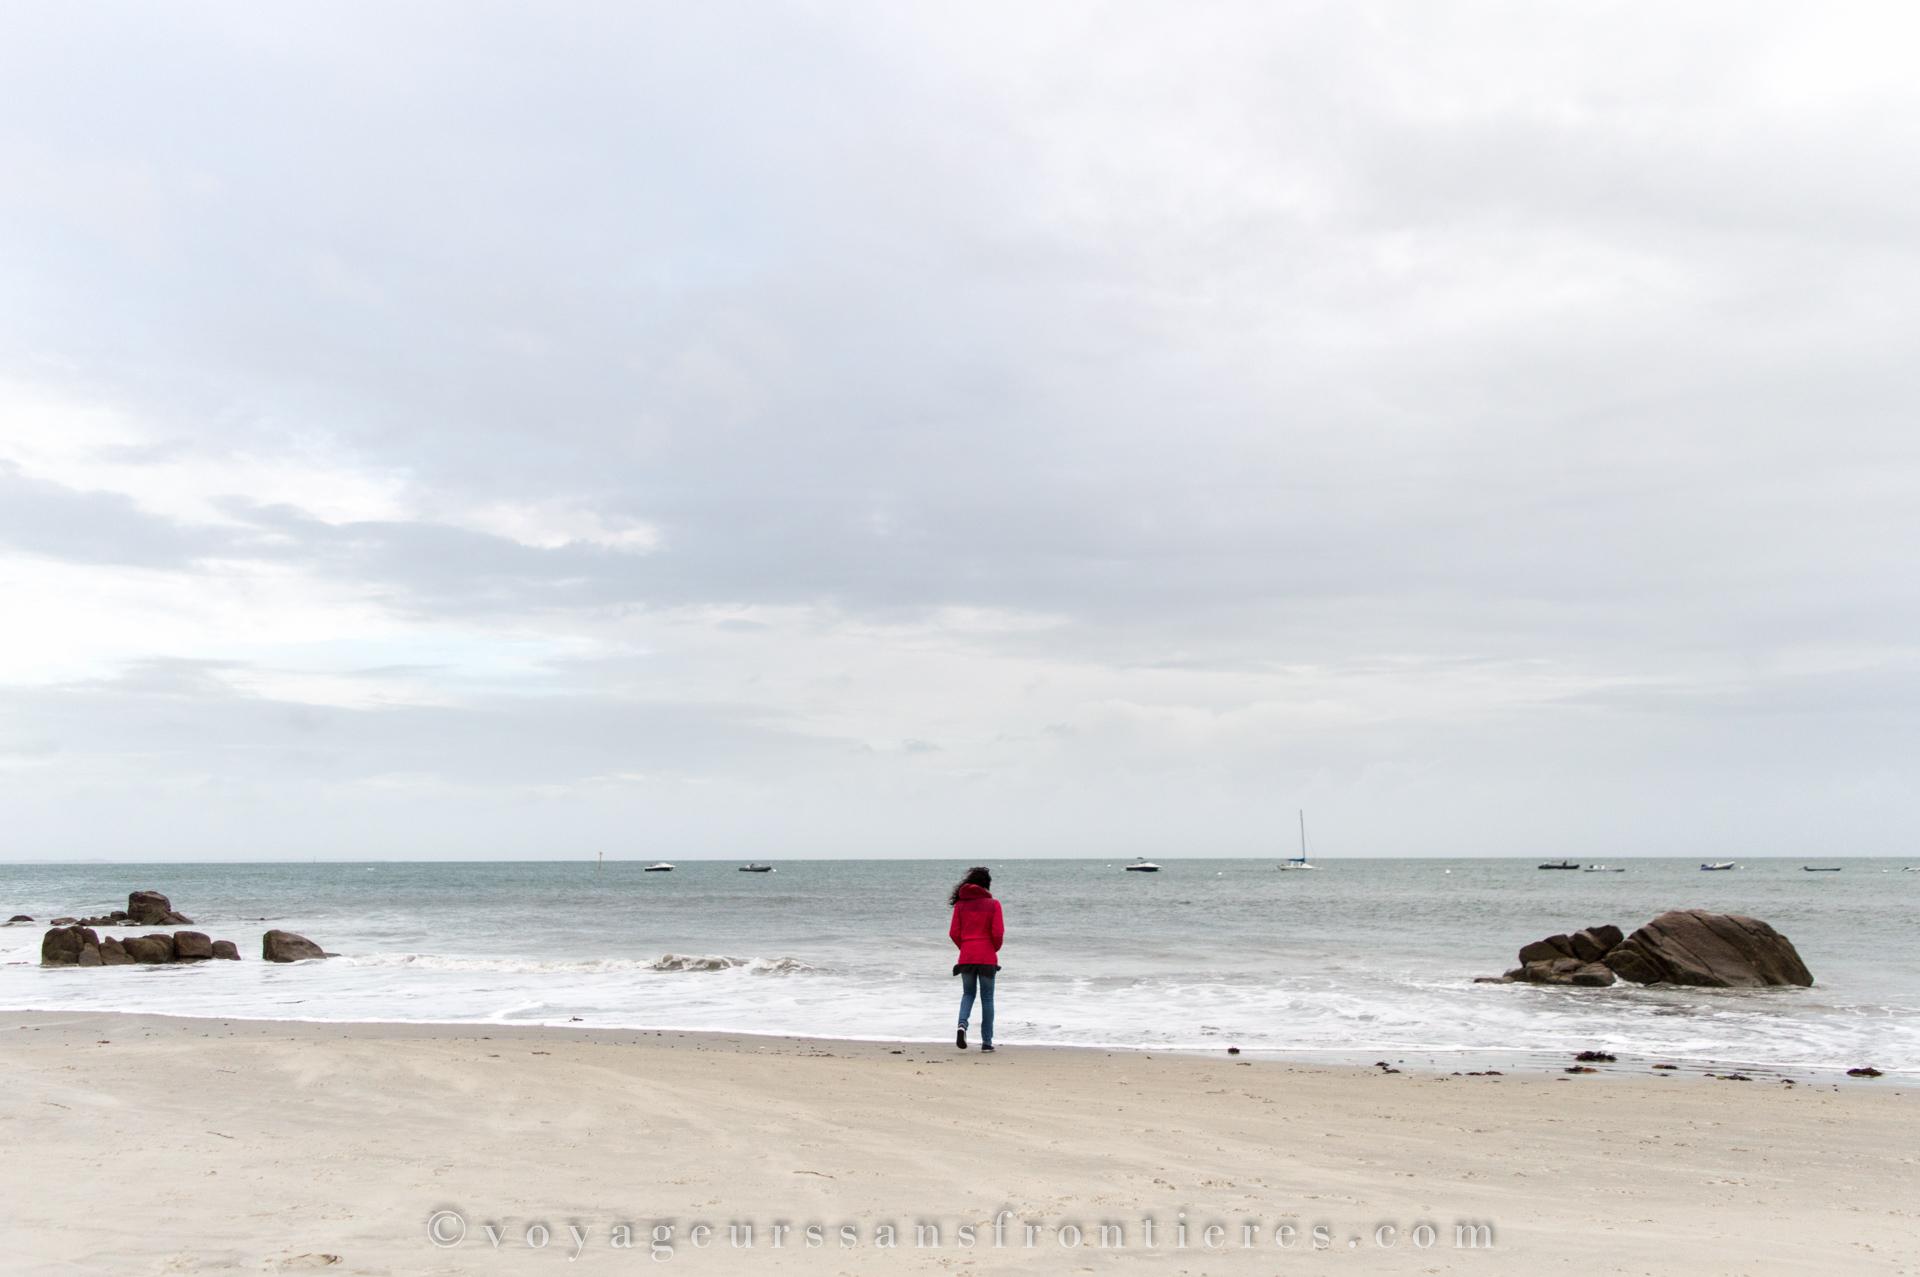 Carnac beach - Brittany